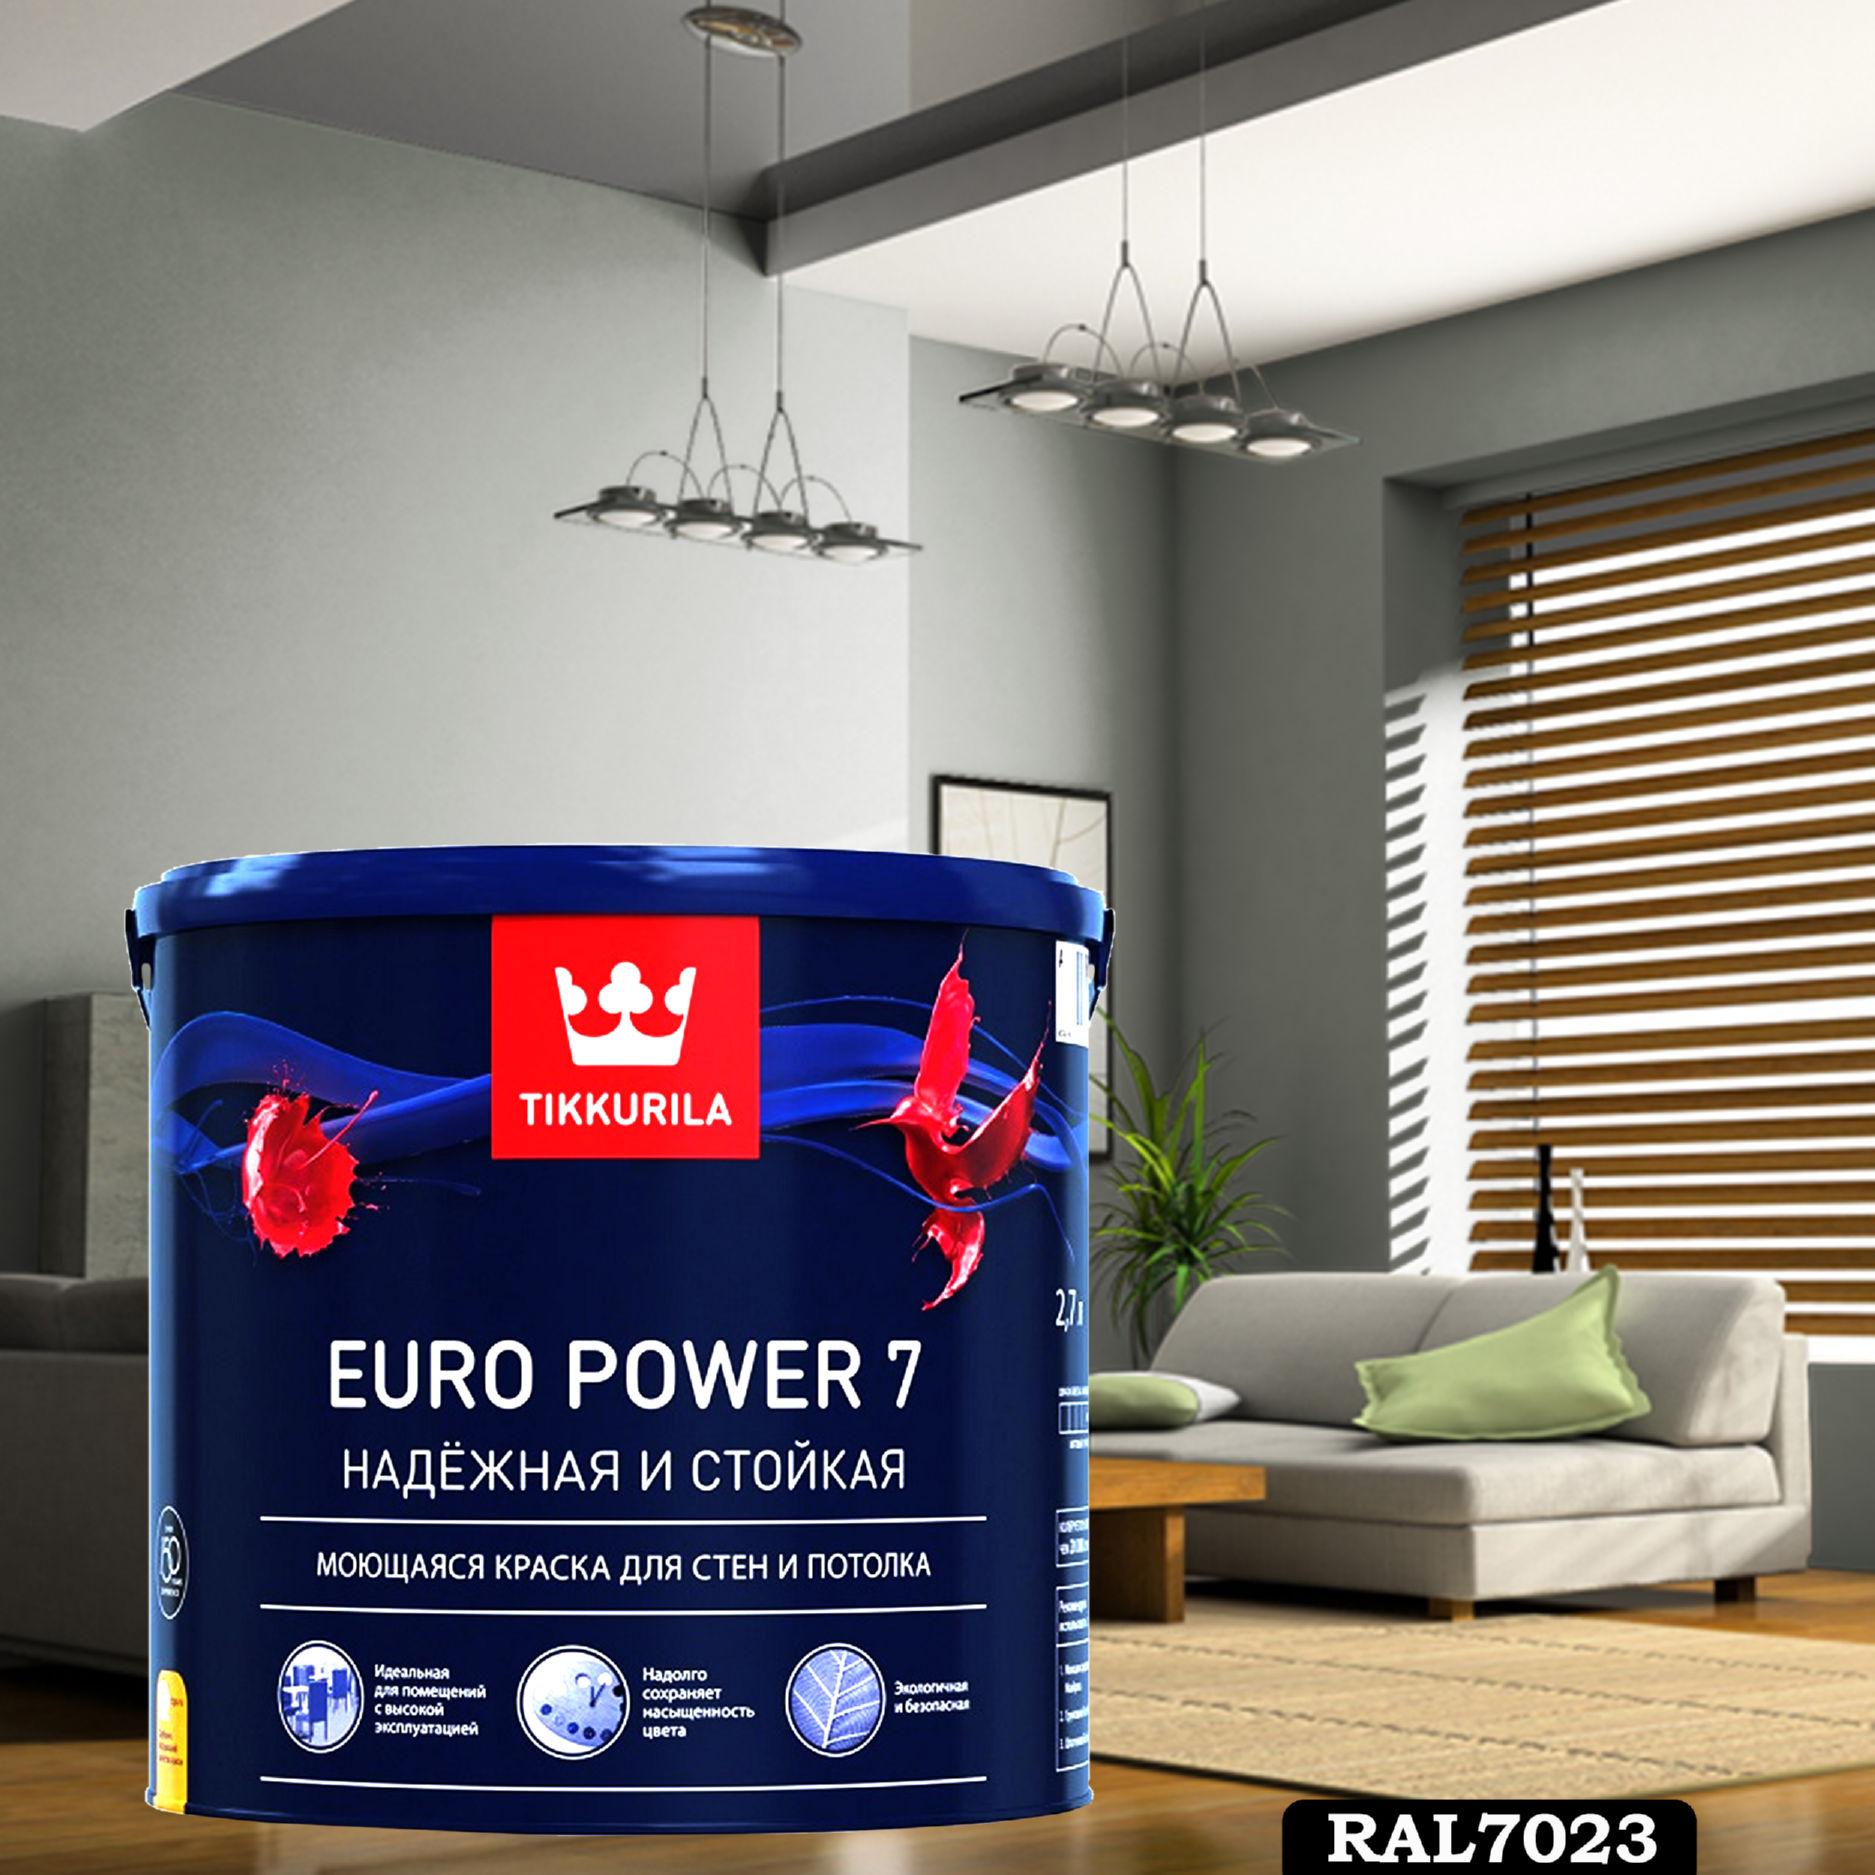 Фото 18 - Краска TIKKURILA Euro Power 7,  RAL 7023 Серый-бетон, латексная моющаяся матовая интерьерная, 9 л.